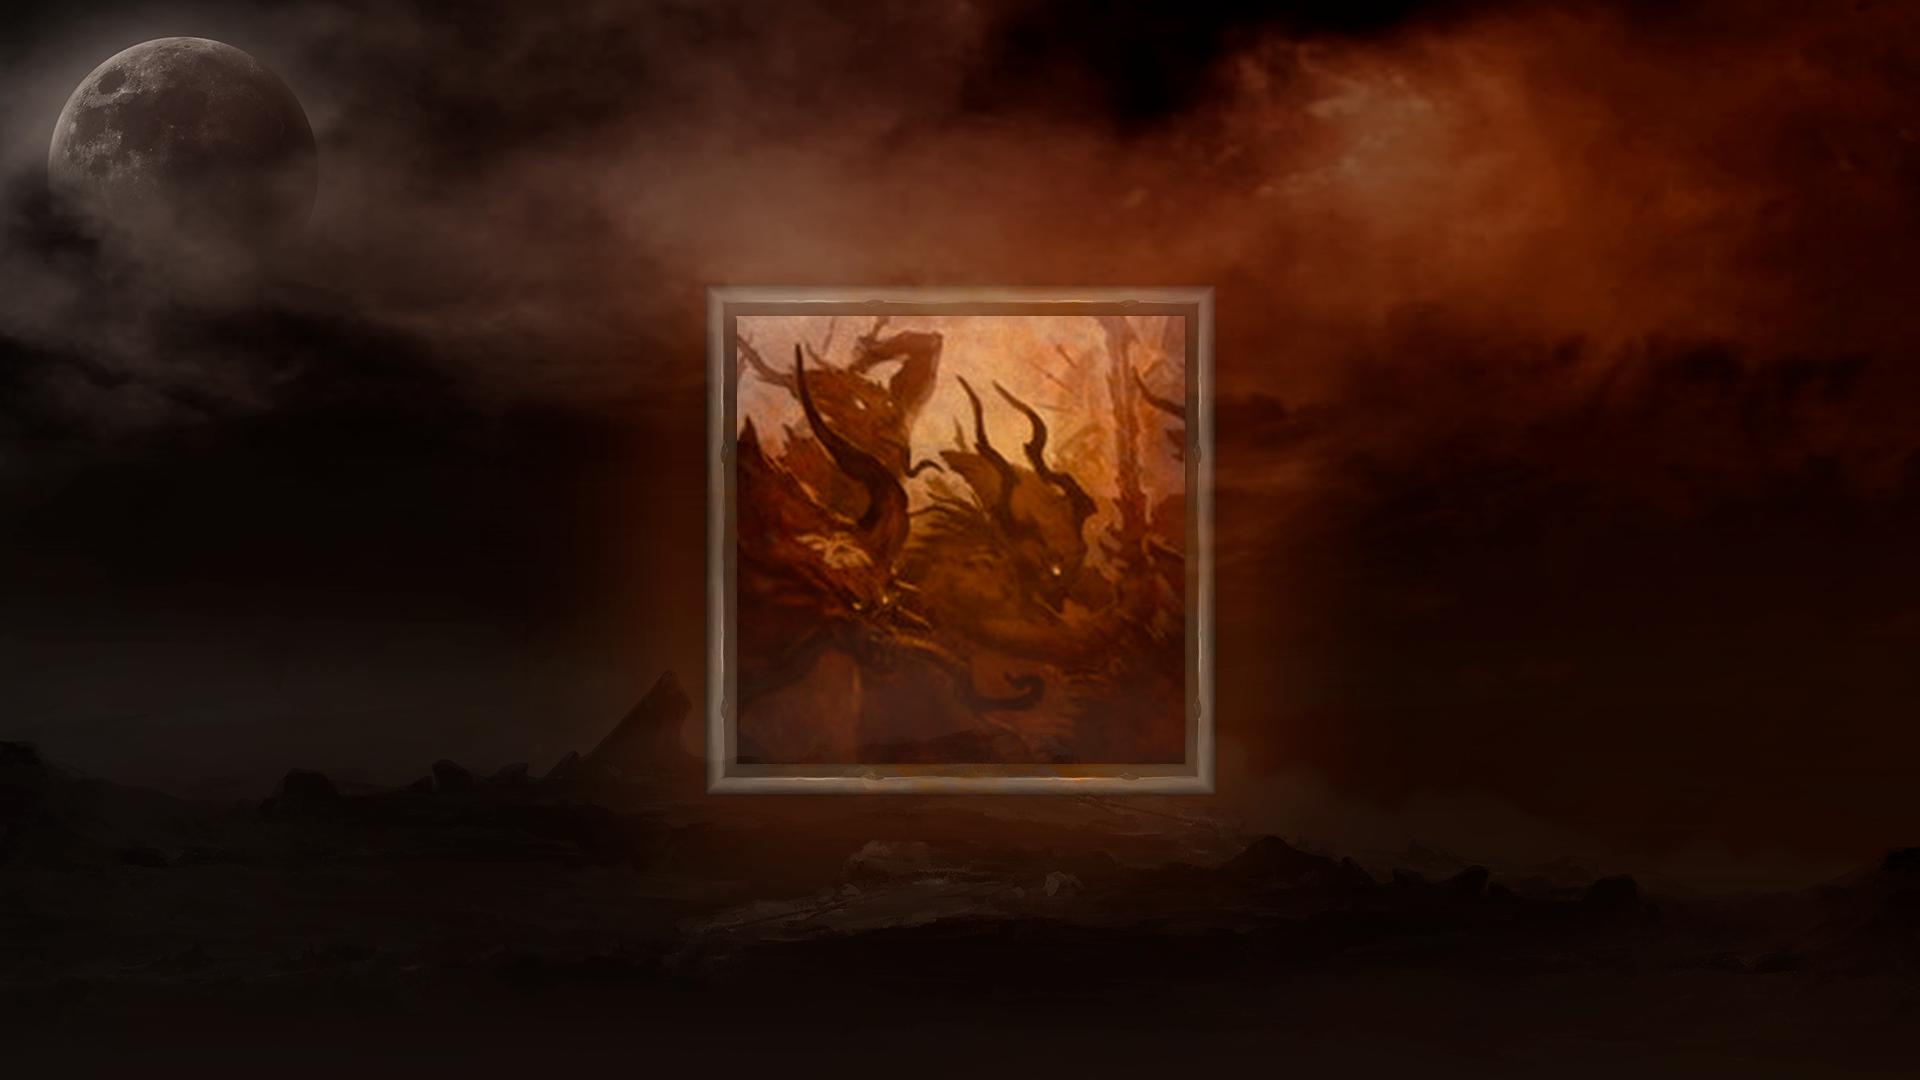 Daemon slayer